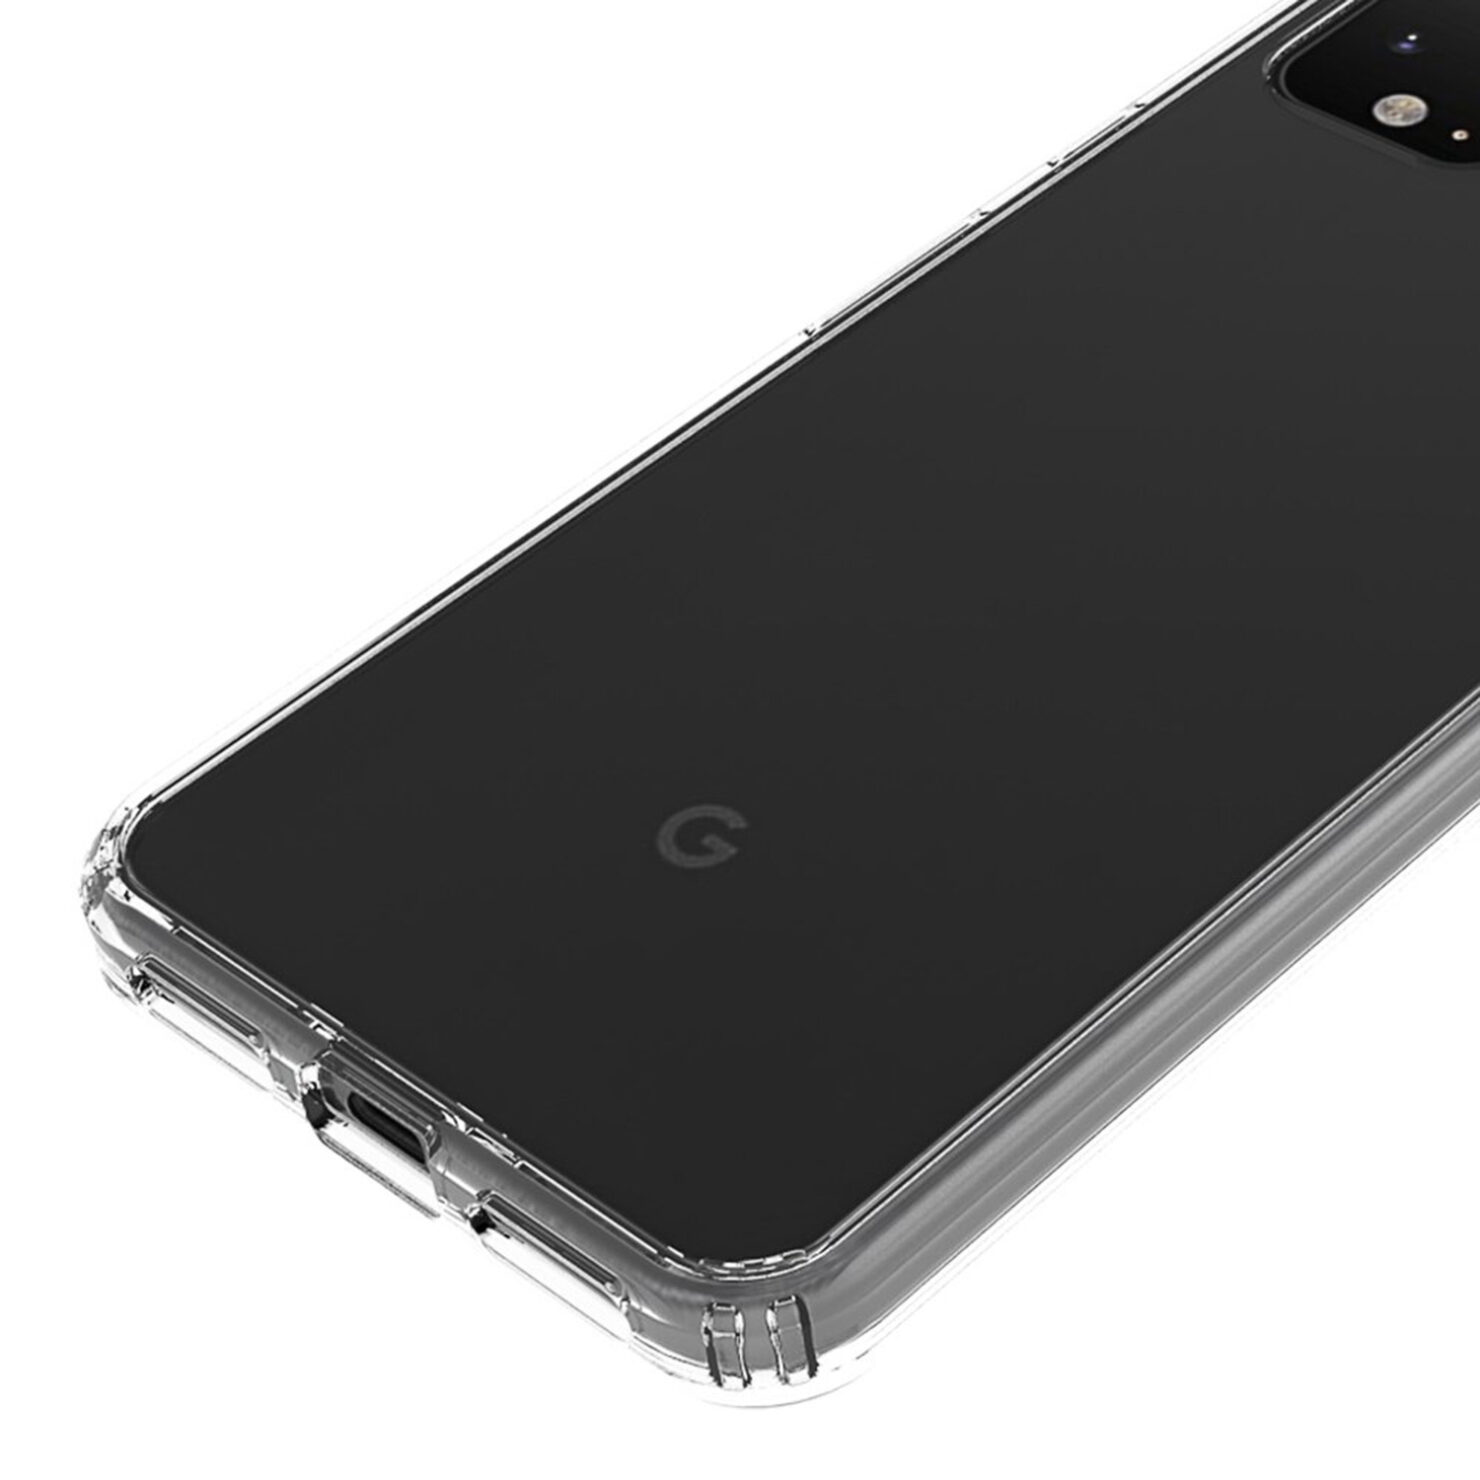 Pixel 4 and Pixel 4 XL case renders leaked